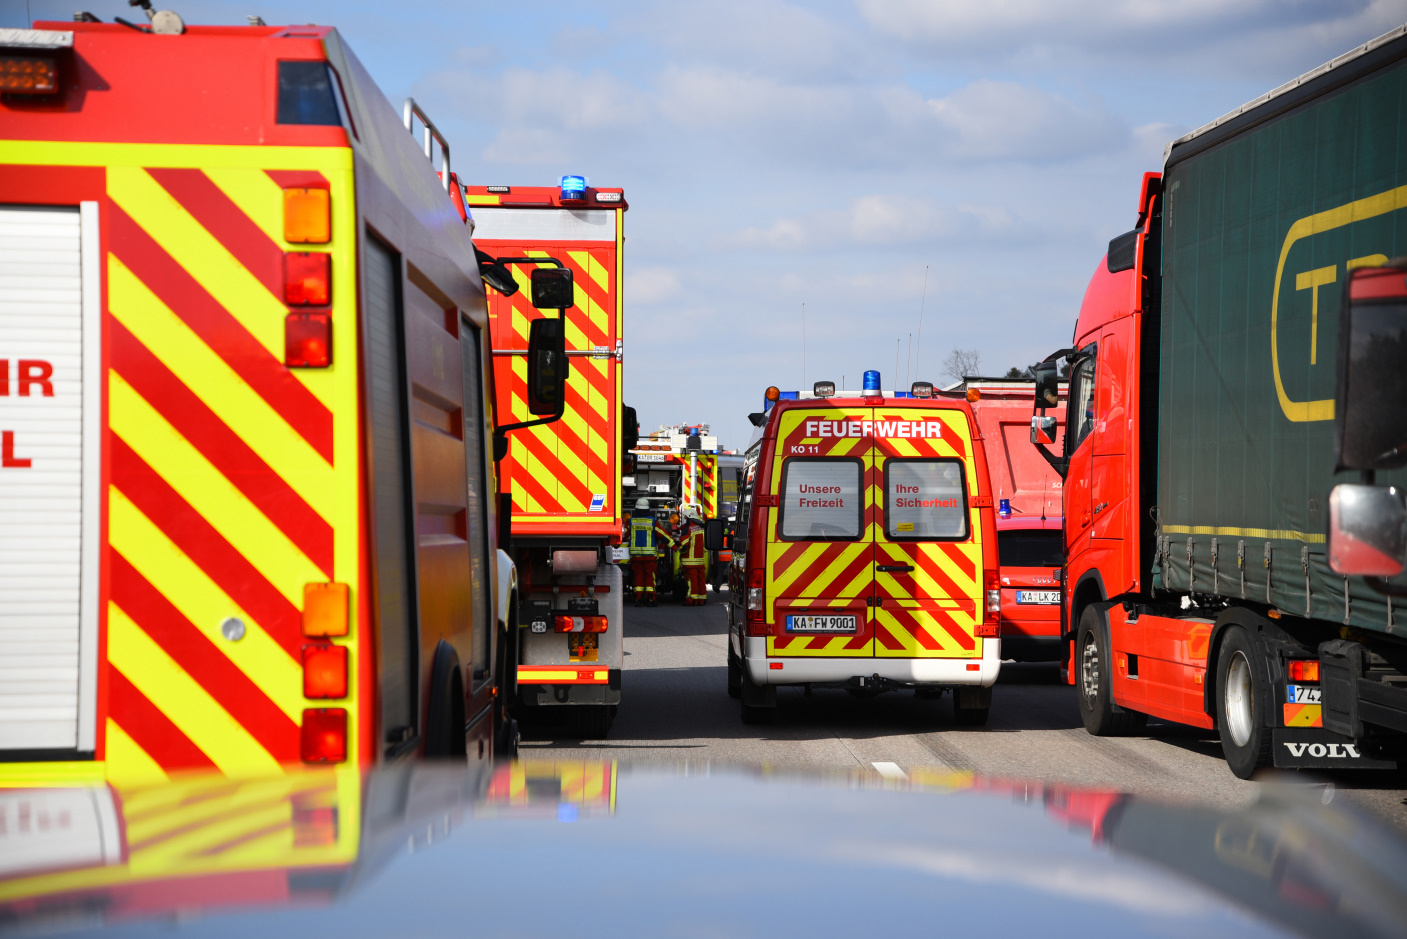 Gem. Kronau/St. Leon-Rot: Schwerer Verkehrsunfall auf A 5 - drei Lkw beteiligt